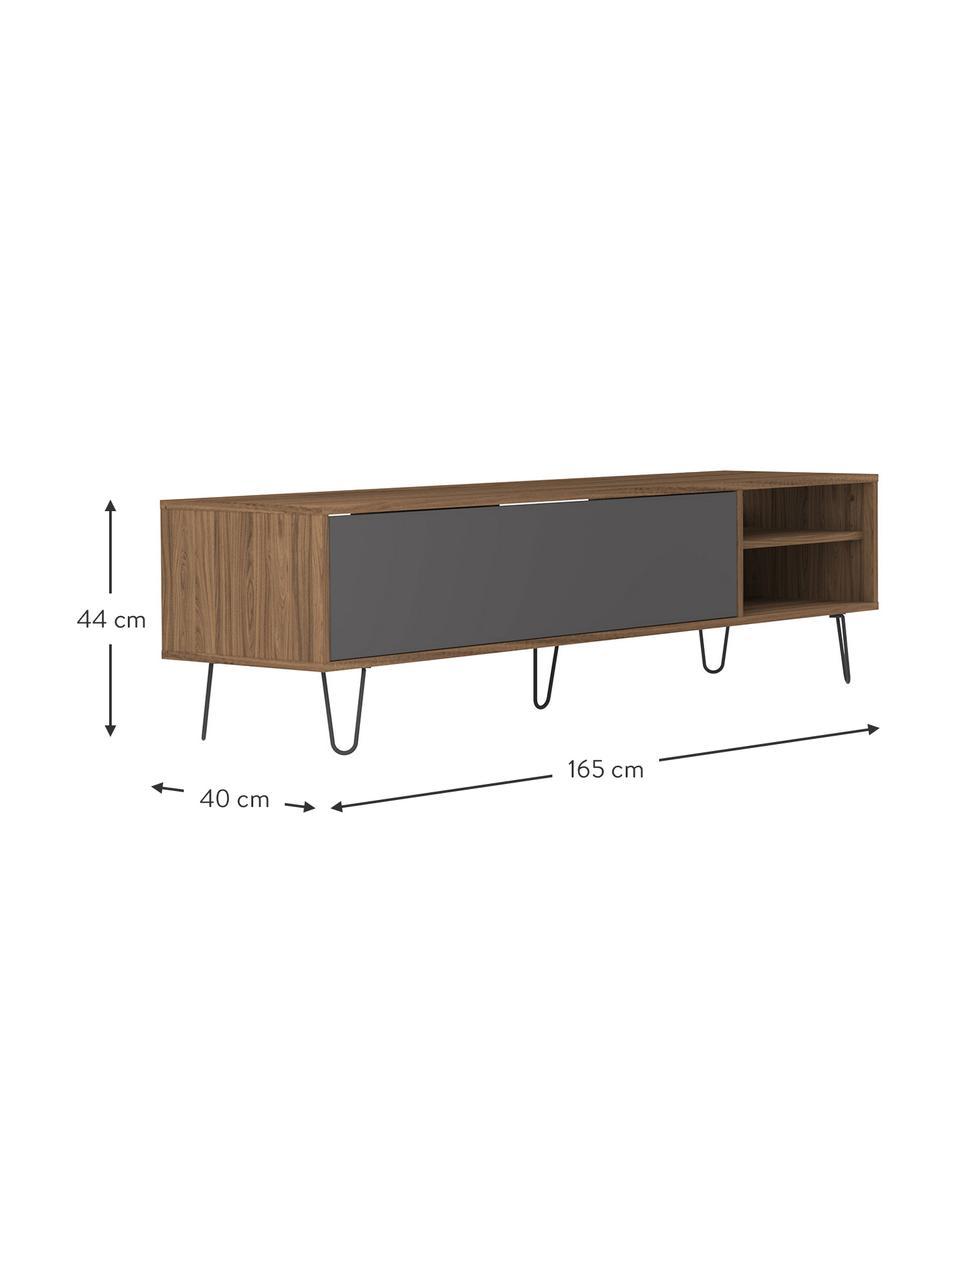 Modernes TV-Lowboard Aero mit Klapptür, Korpus: Spanplatte, melaminbeschi, Füße: Metall, lackiert, Walnussholz, Grau, 165 x 44 cm